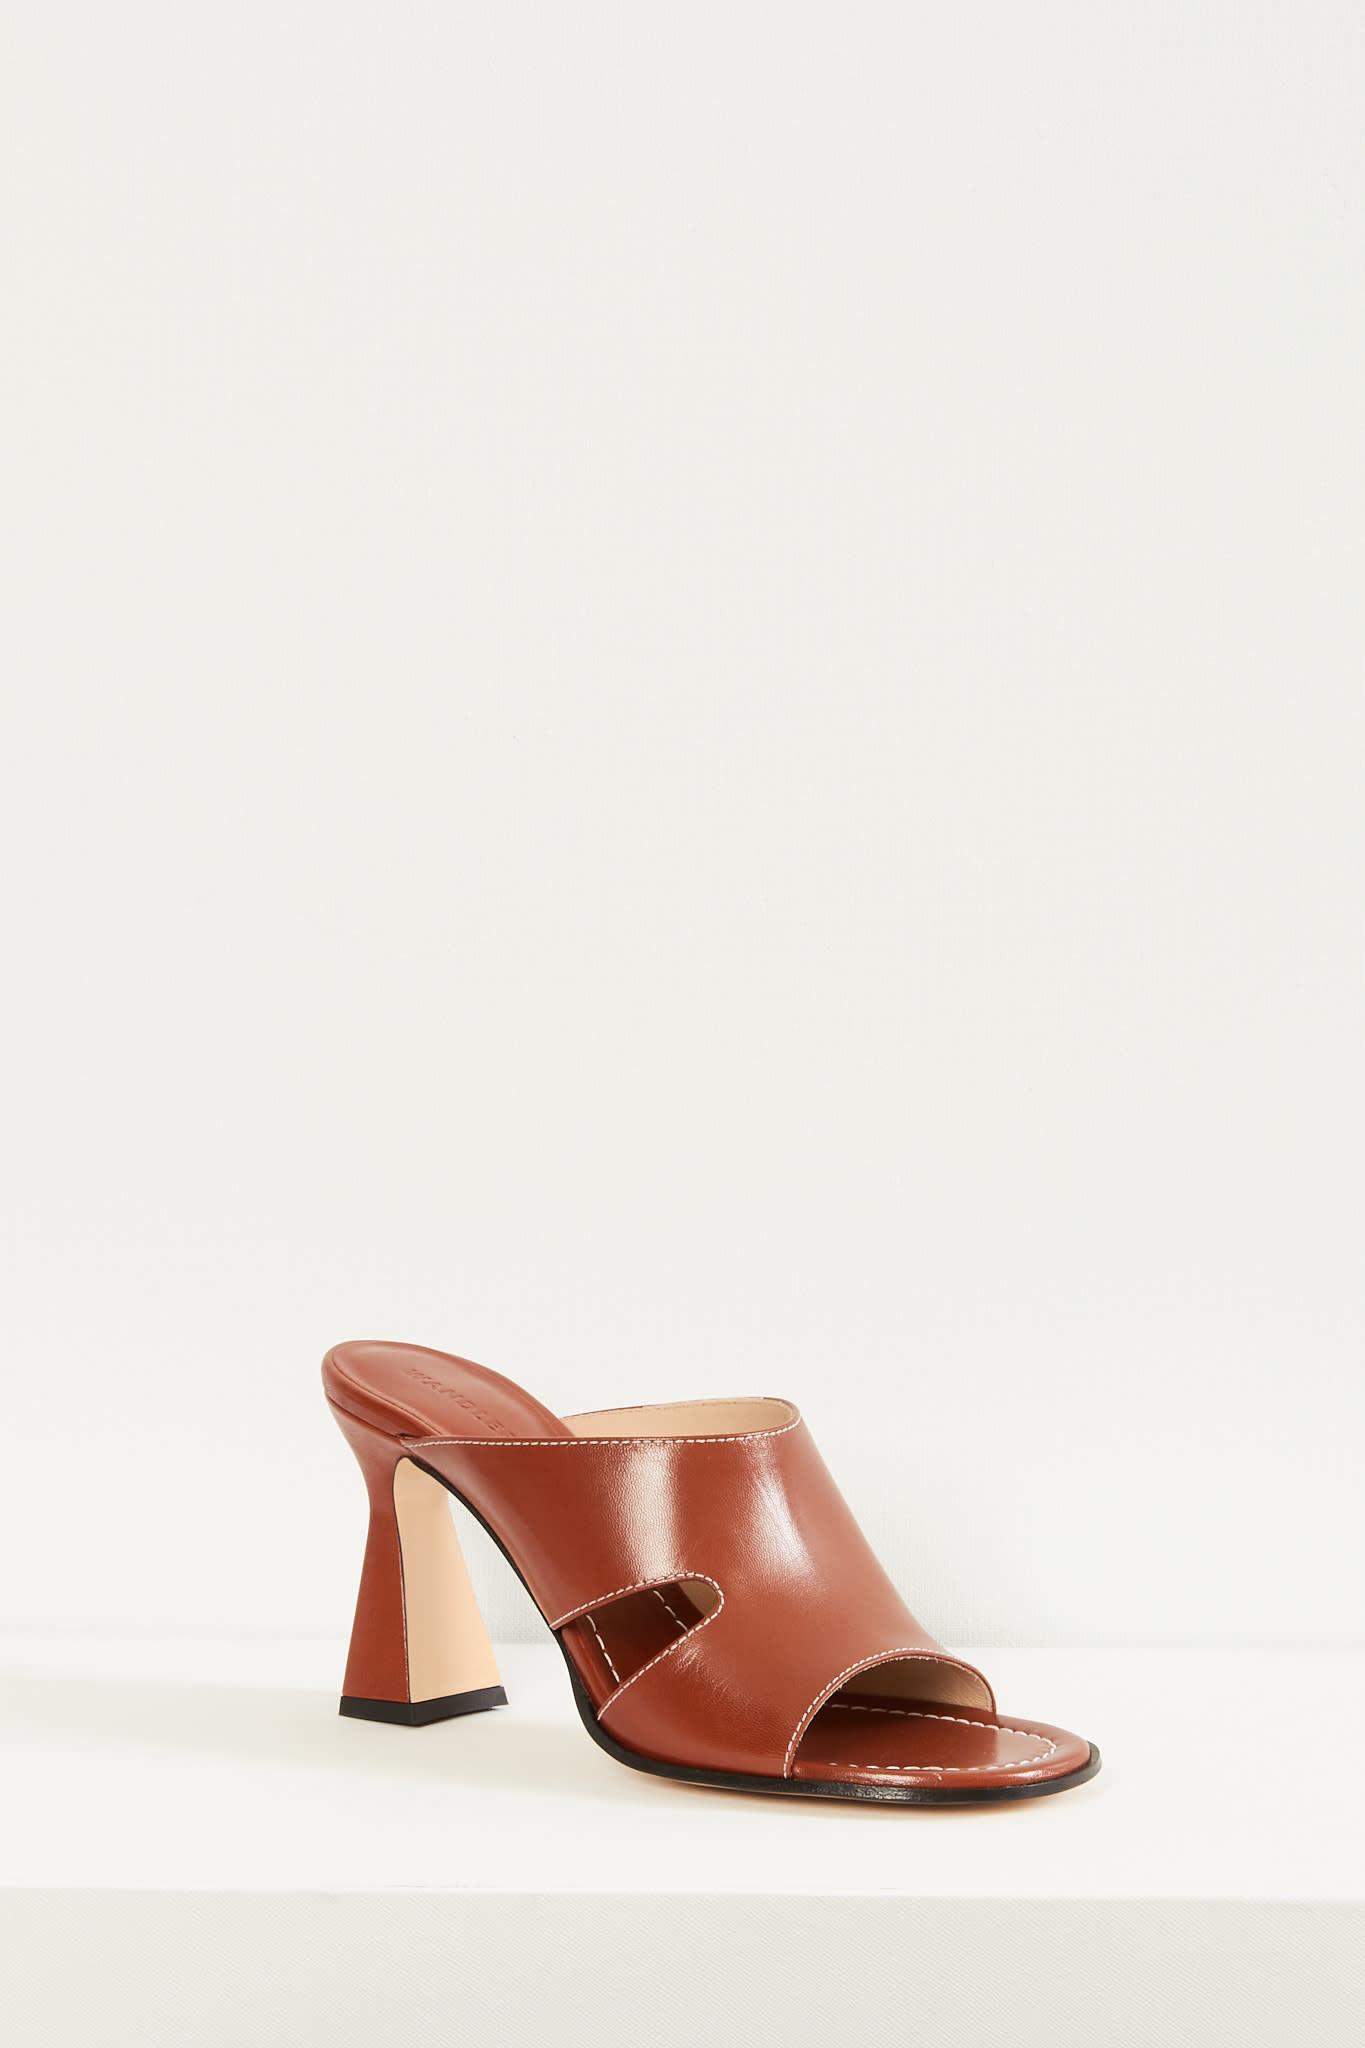 Wandler Marie sandal lambskin leather